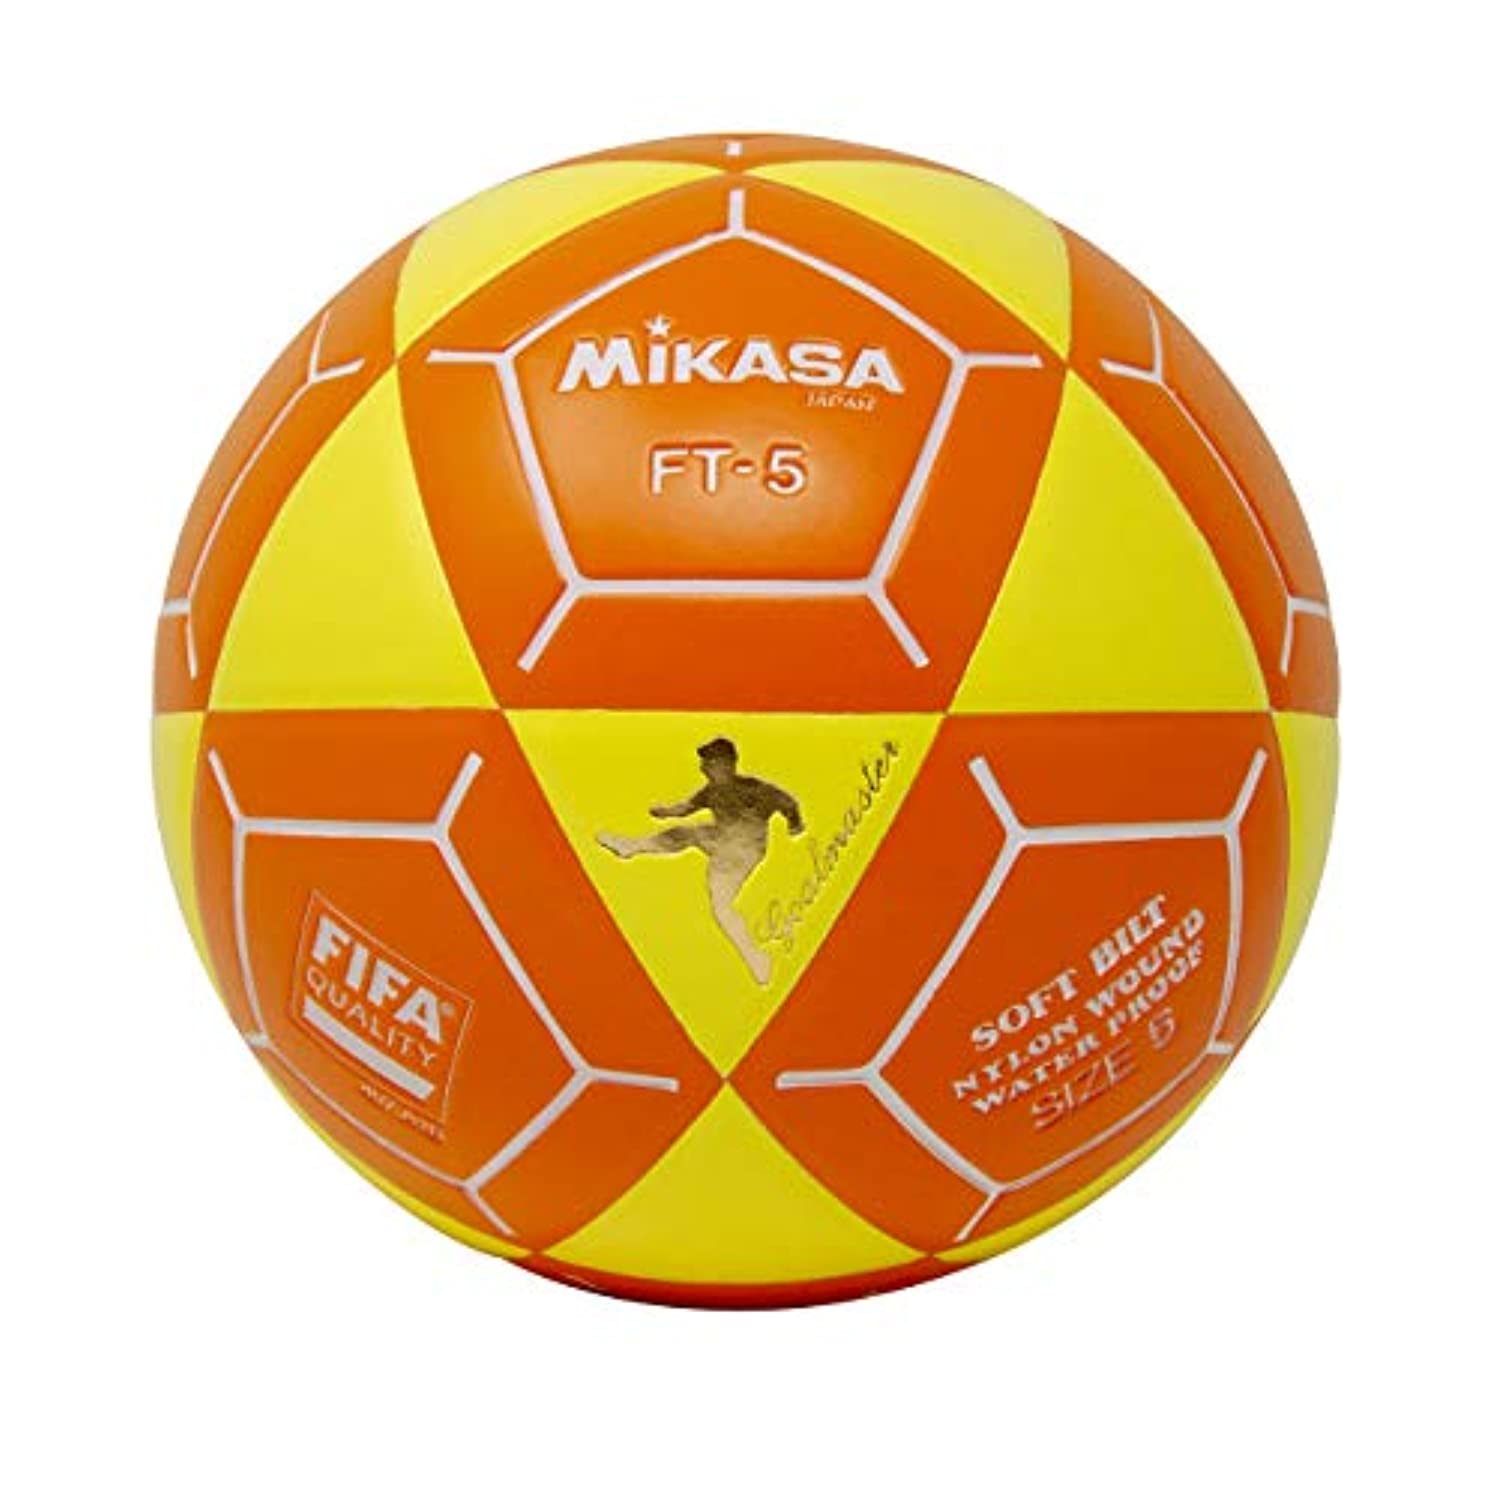 Mikasa FT5 Goal Master Soccer Ball, Yellow/Orange, Size 5